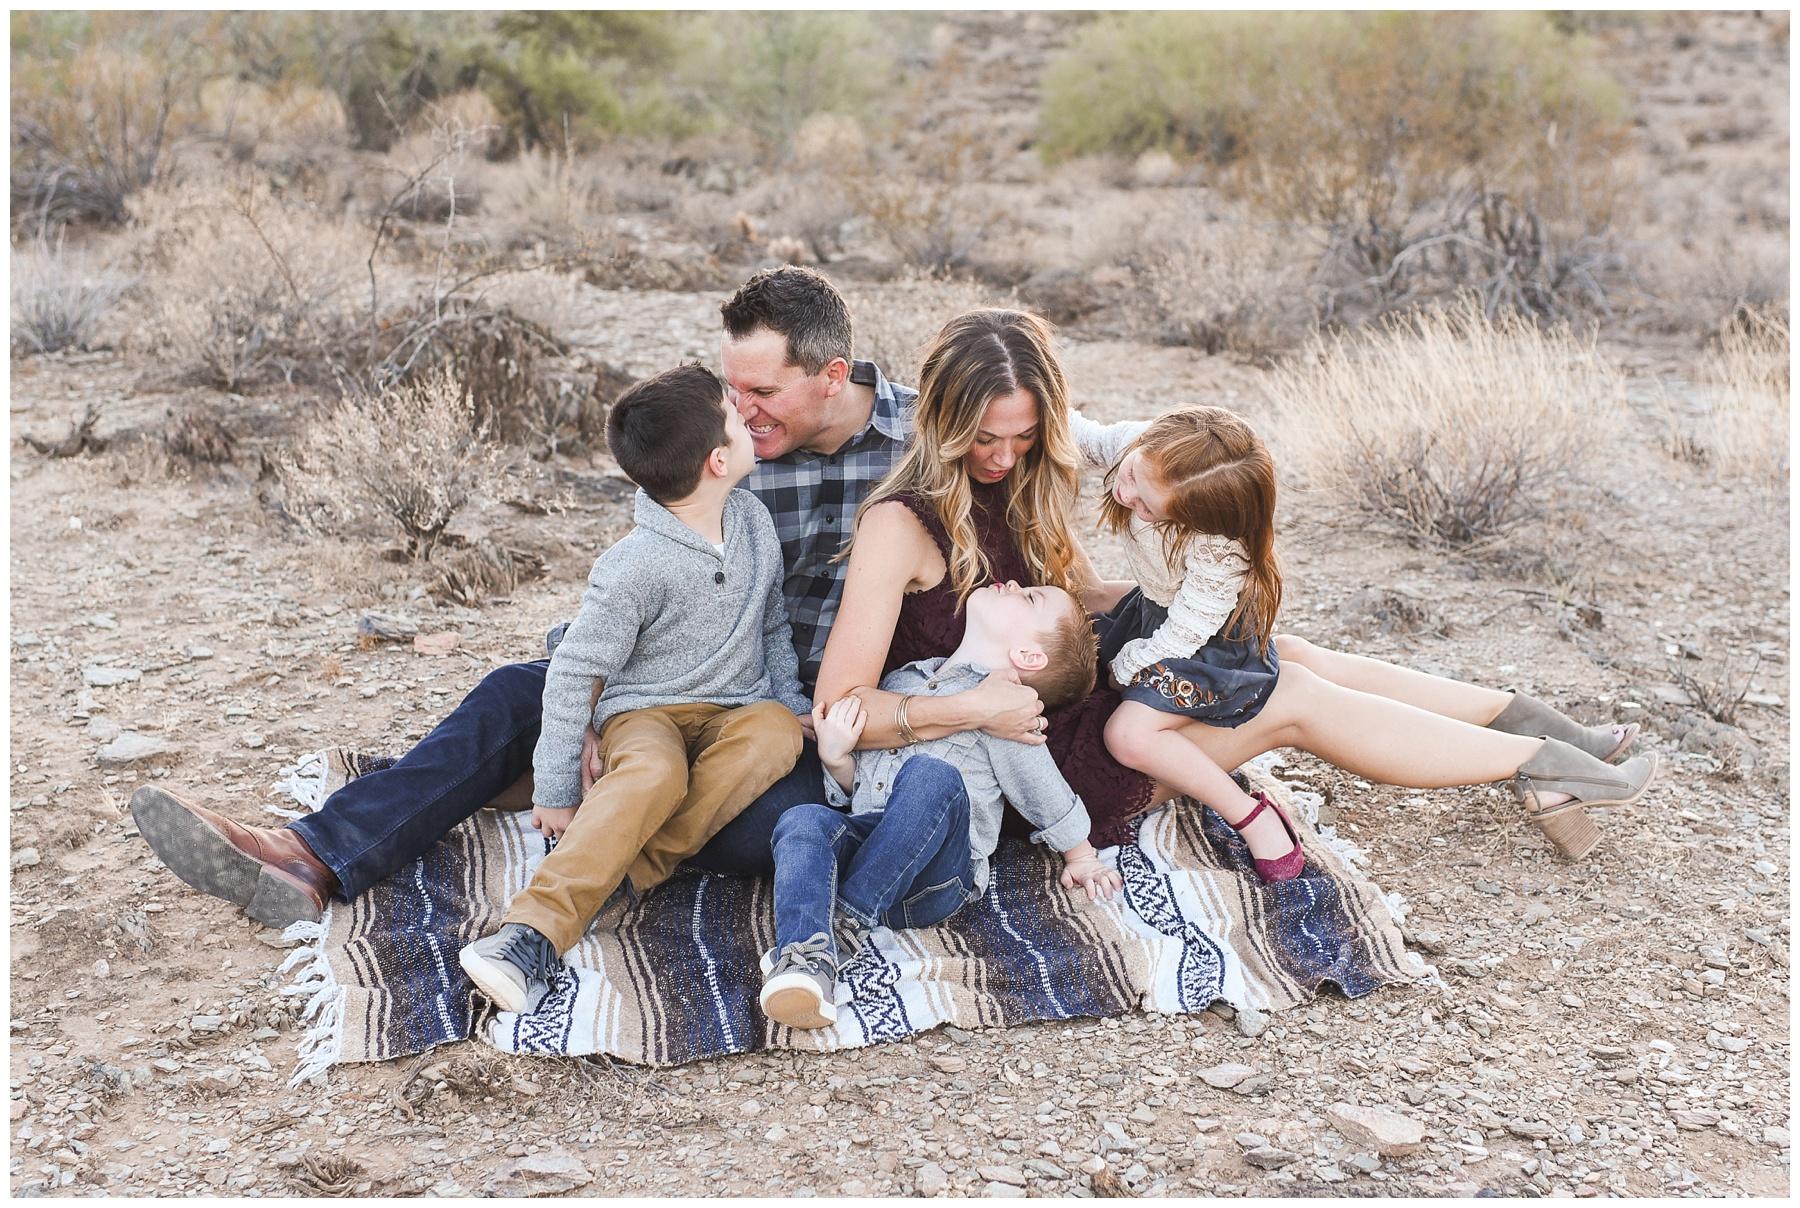 Desert lifestyle family shot   Phoenix Family Photography